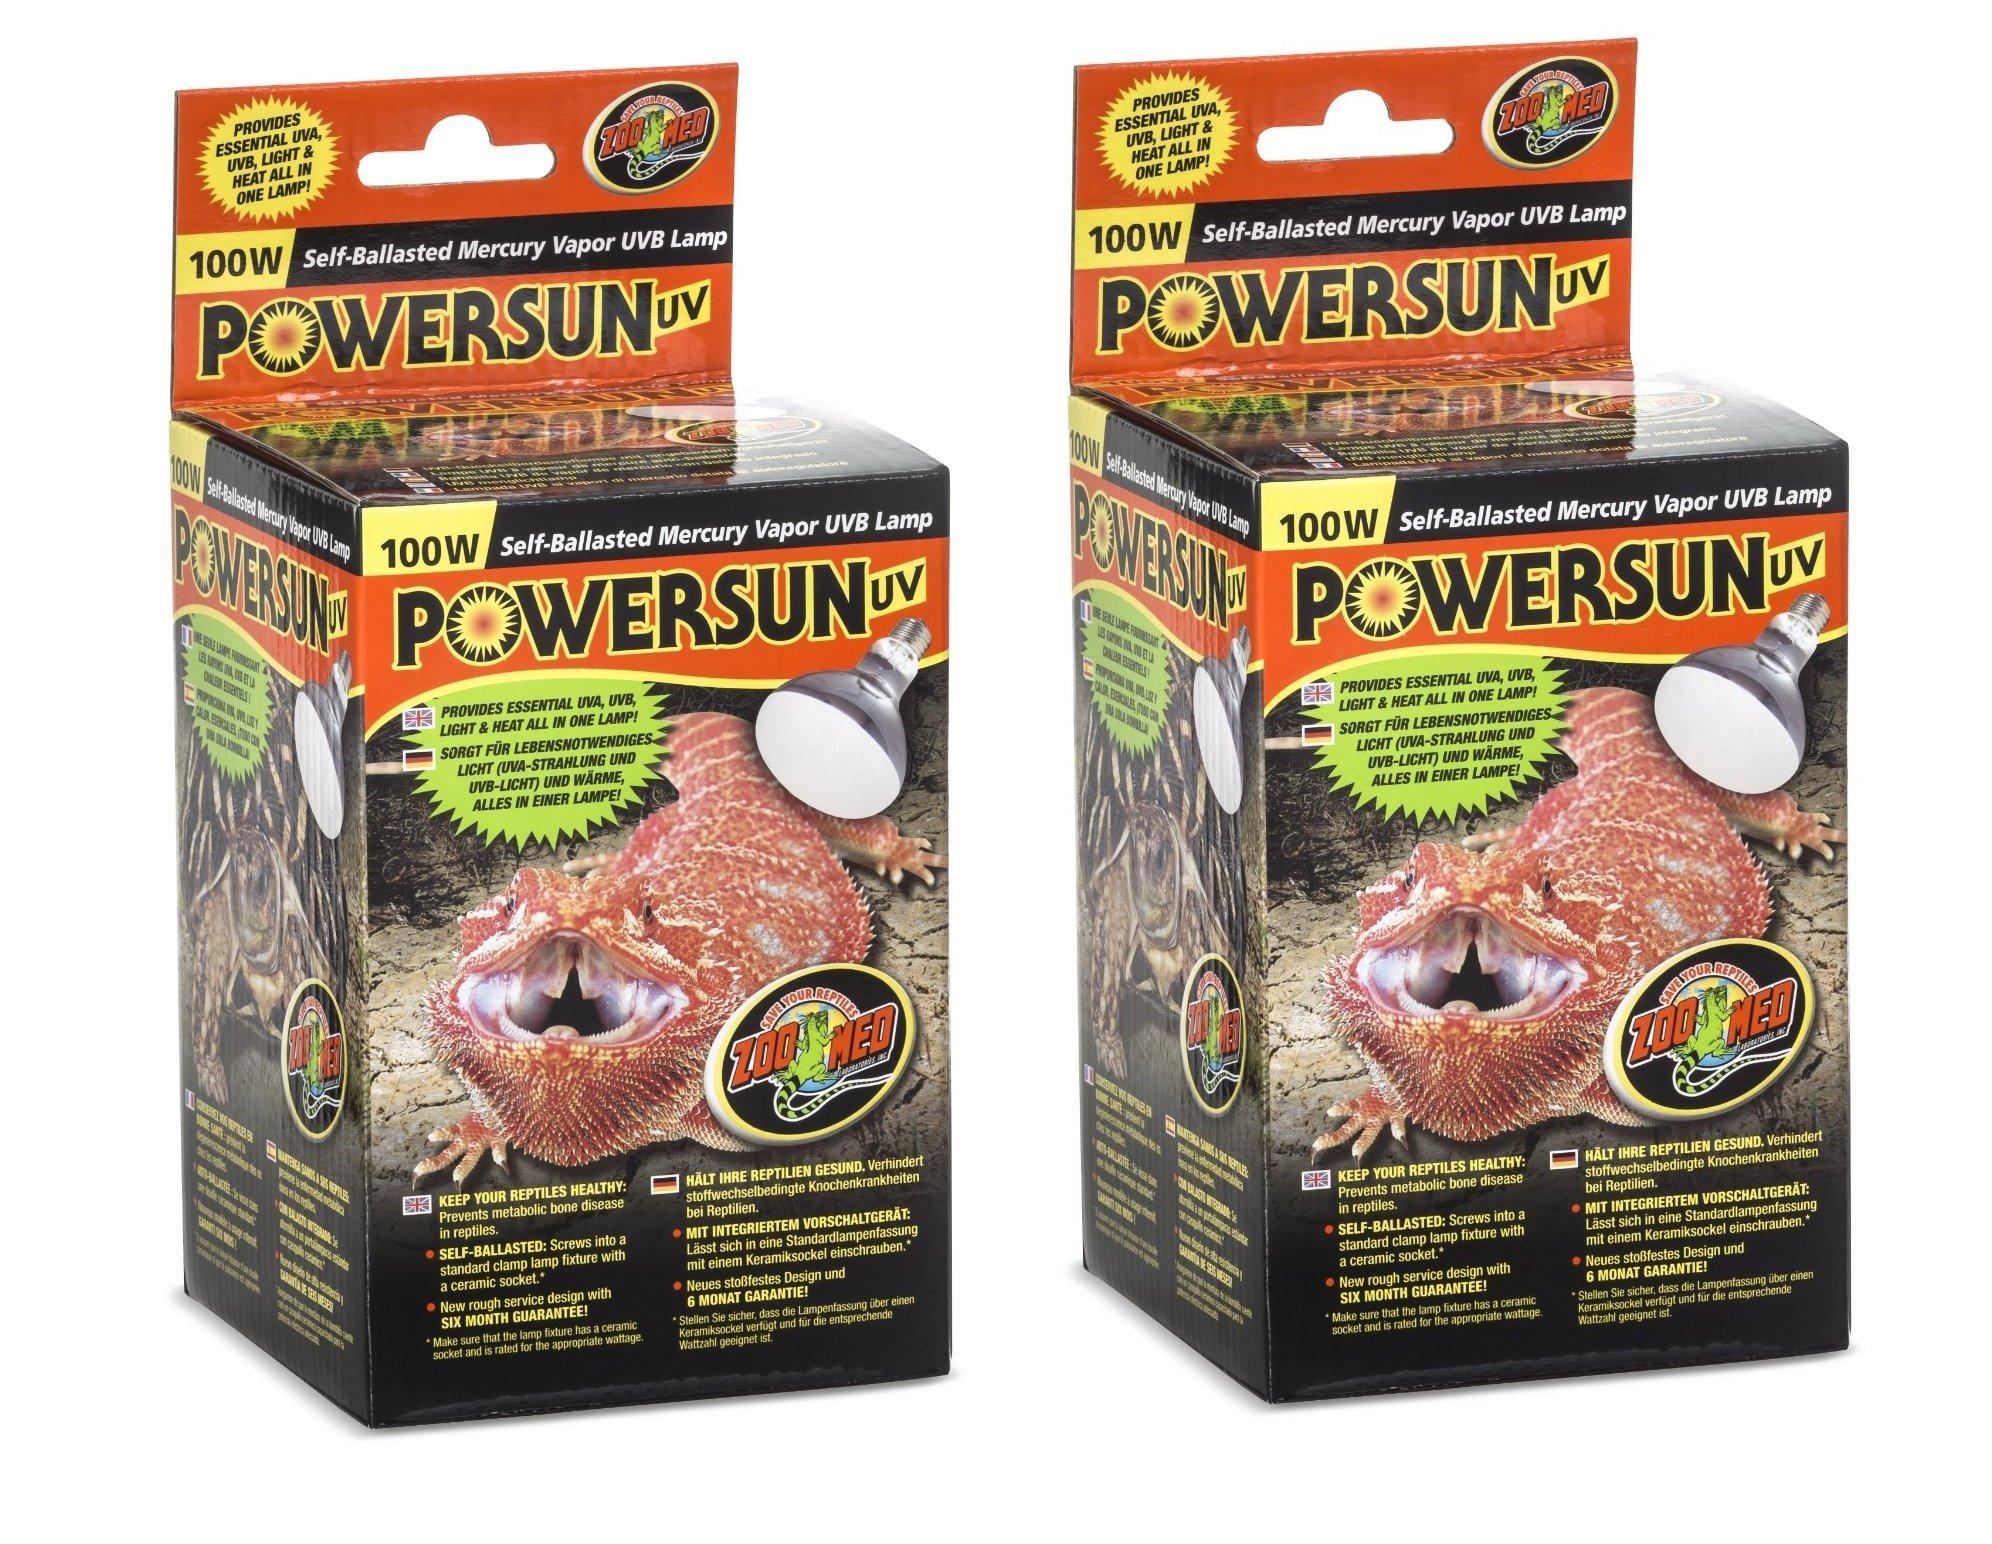 Zoo Med PowerSun UV Mercury Vapor Lamp 100 Watts (2 Pack)